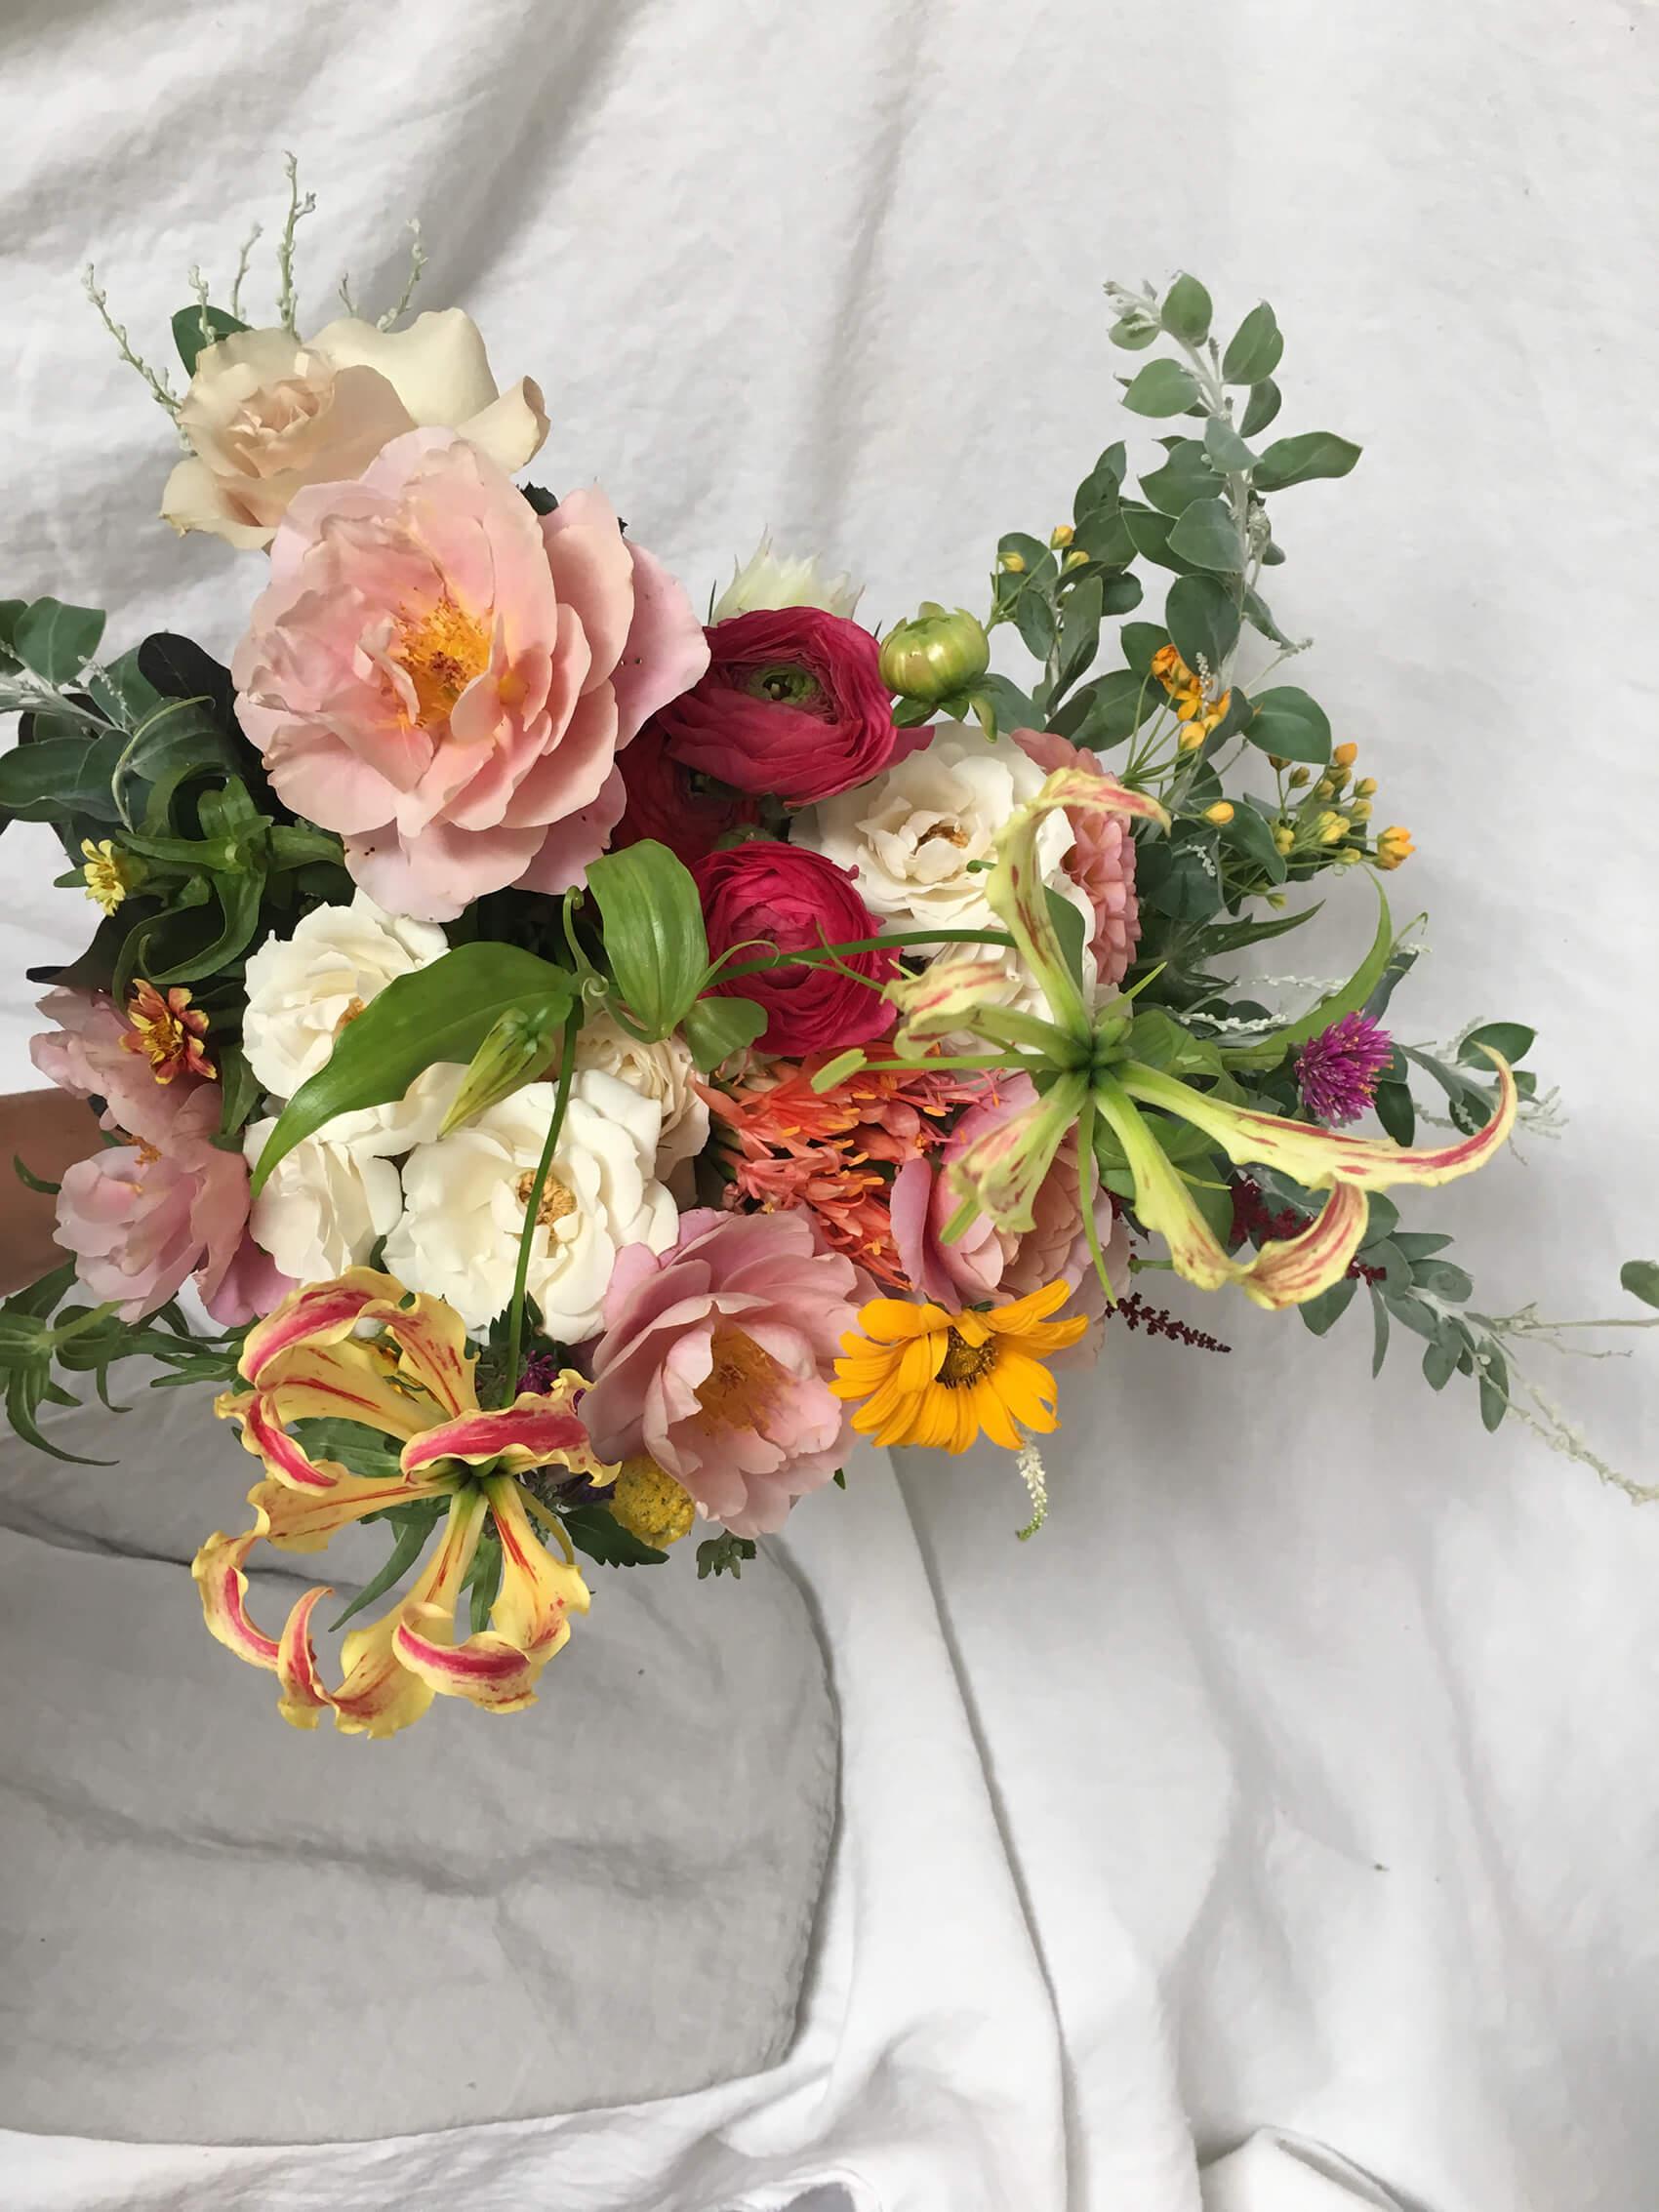 Pigsty_floral_studio_8